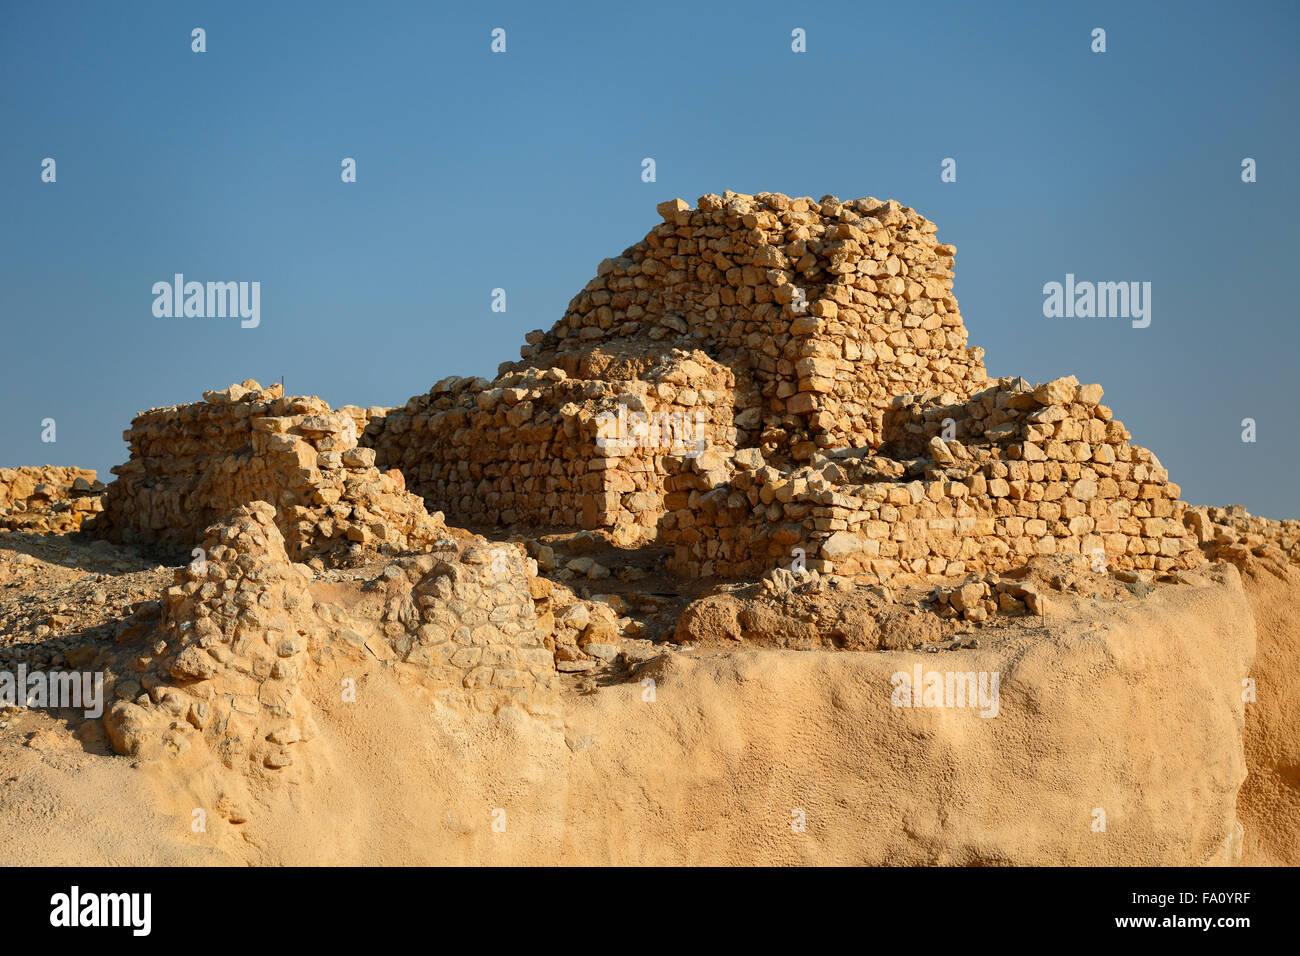 Ruins of the old city of Ubar in the Rub al-Khali desert at Shisr, Dhofar, Oman Stock Photo